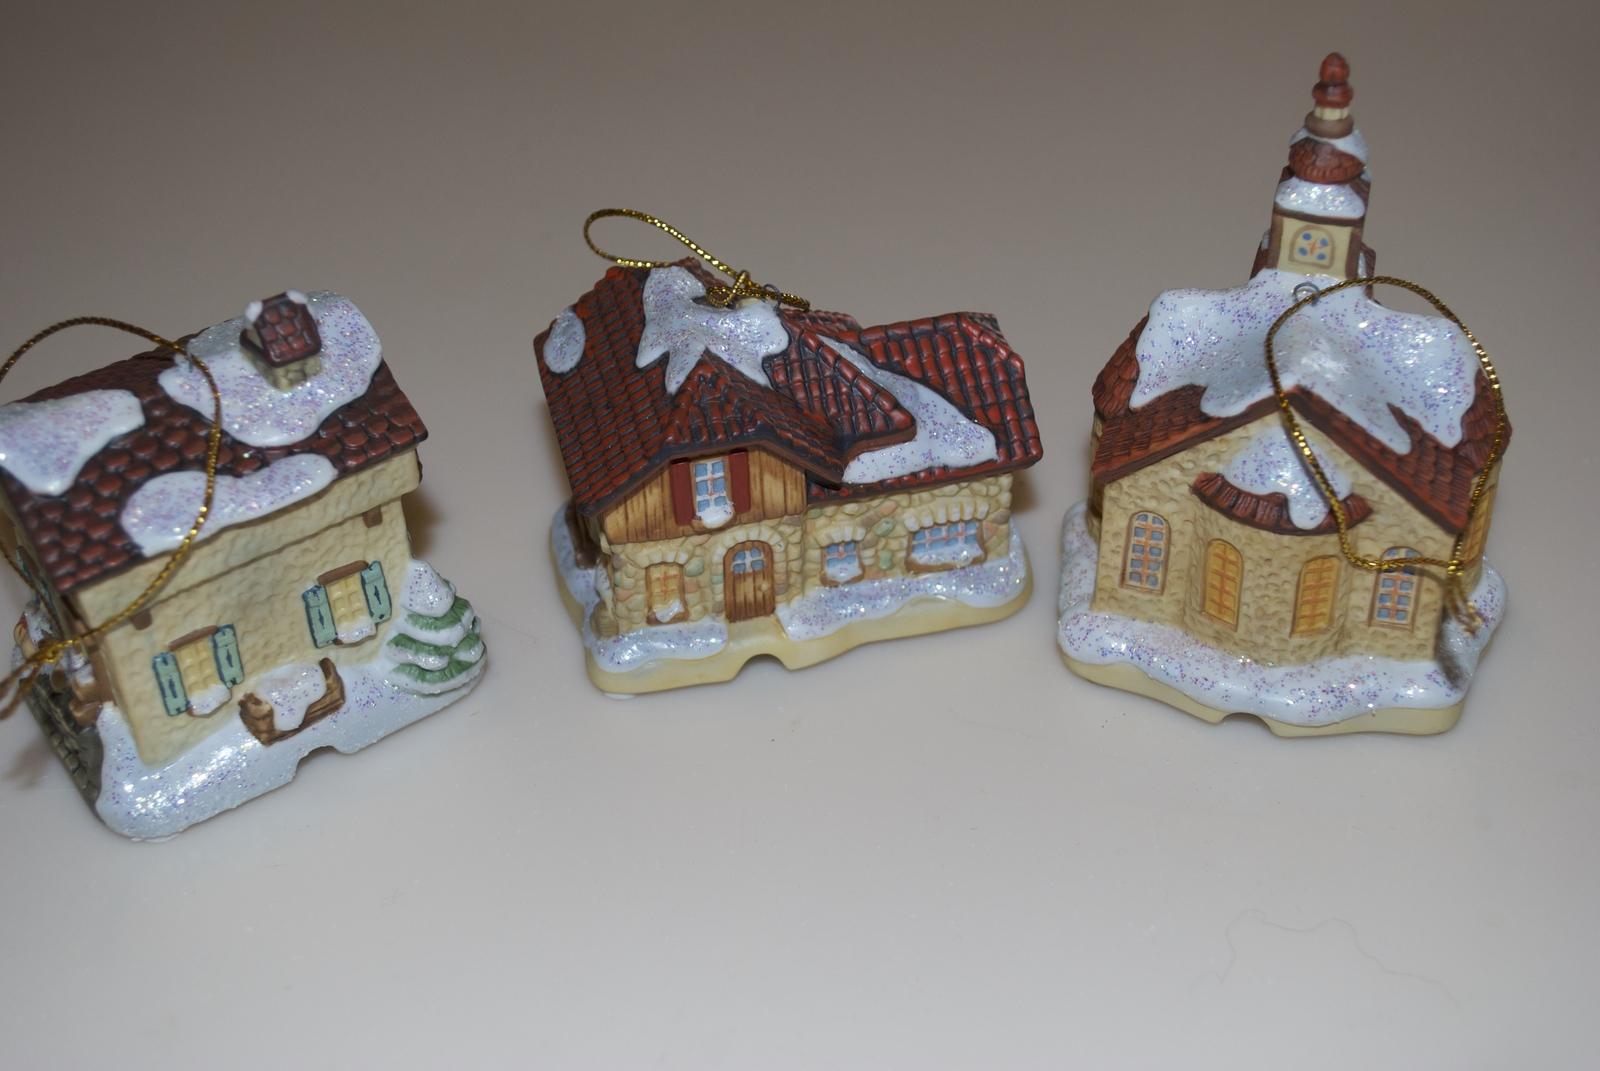 Hummel Bradford Editions Bavarian Village Christmas Ornaments Postamt Bahnhof